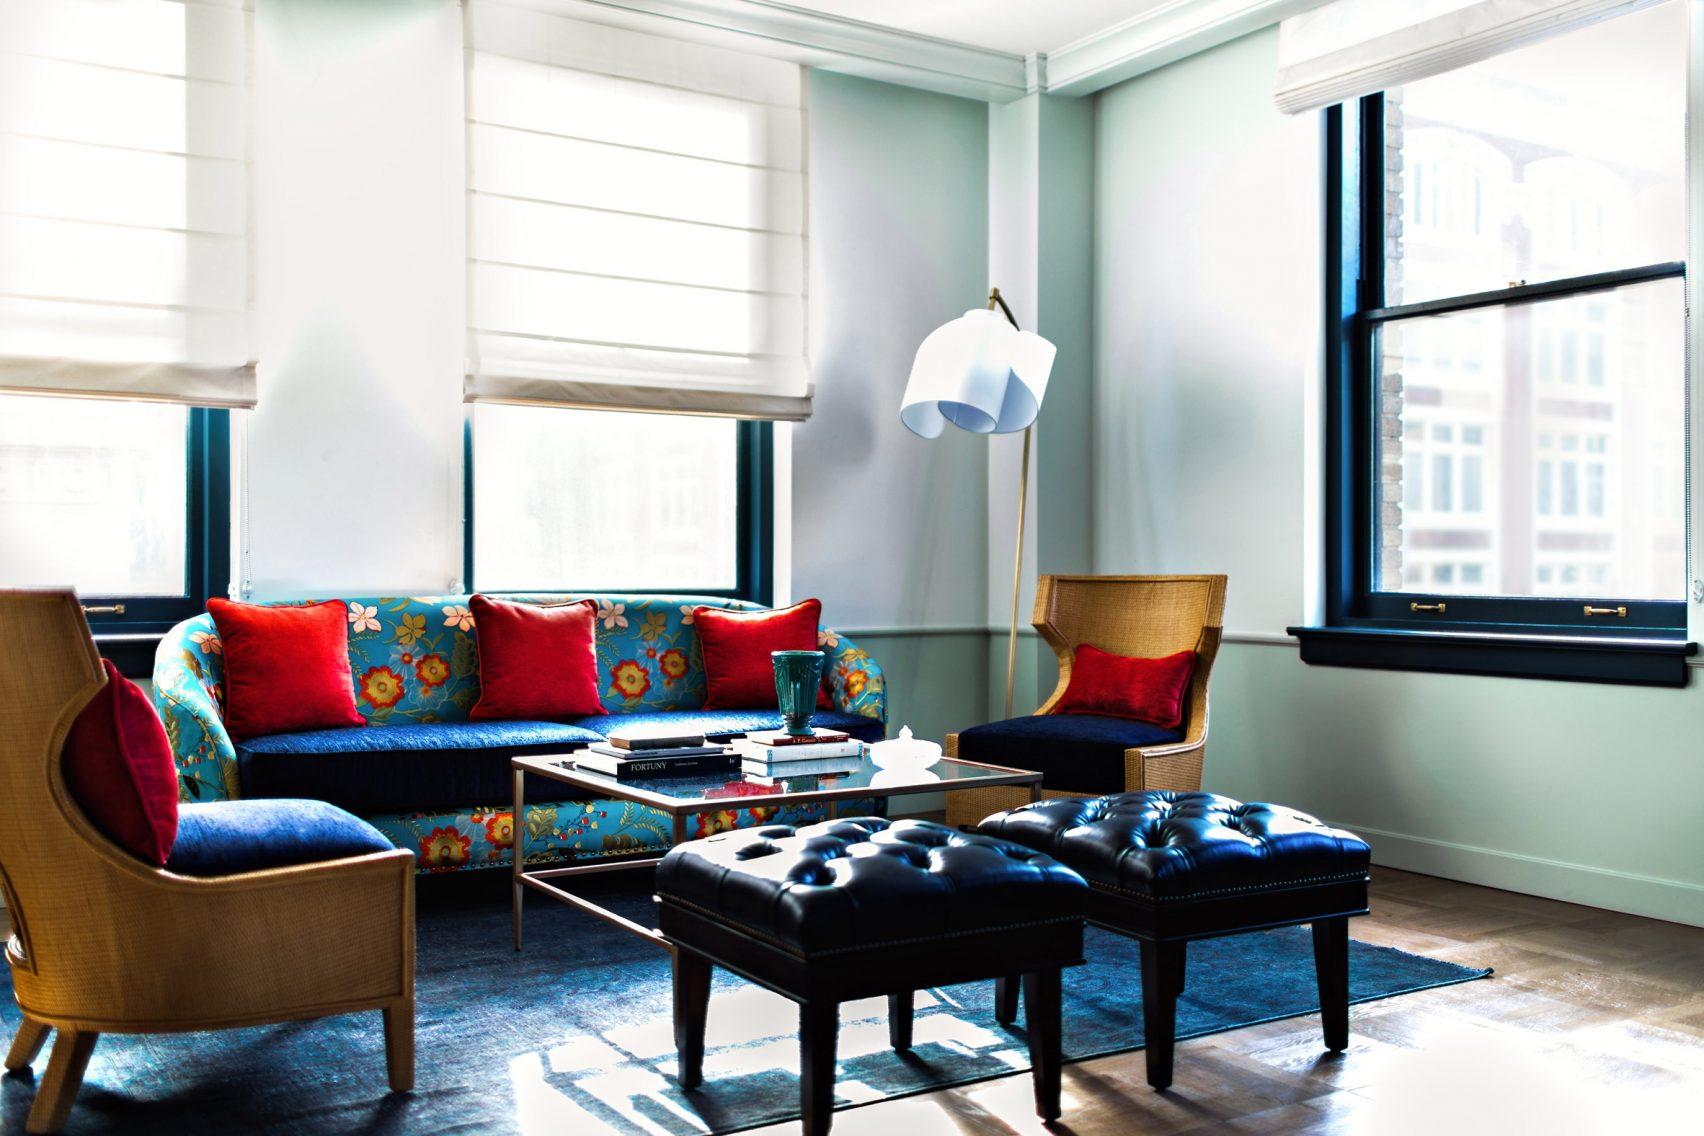 nomad-hotel-los-angeles-jacques-garcia-usa-interiors_dezeen_2364_col_2-1704x1136